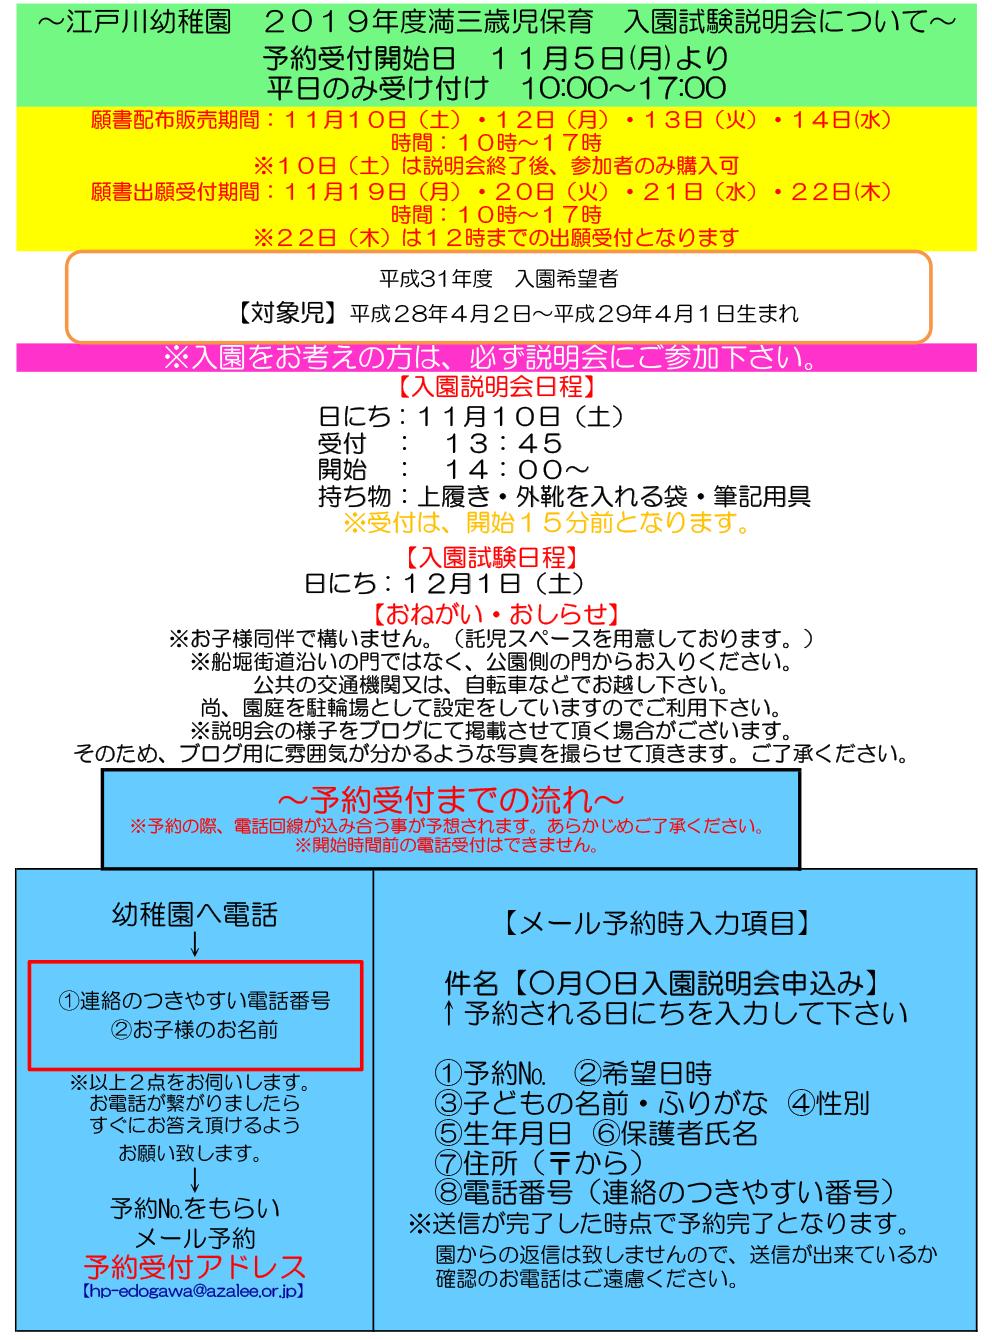 江戸川幼稚園 満三歳児保育 入園試験説明会について